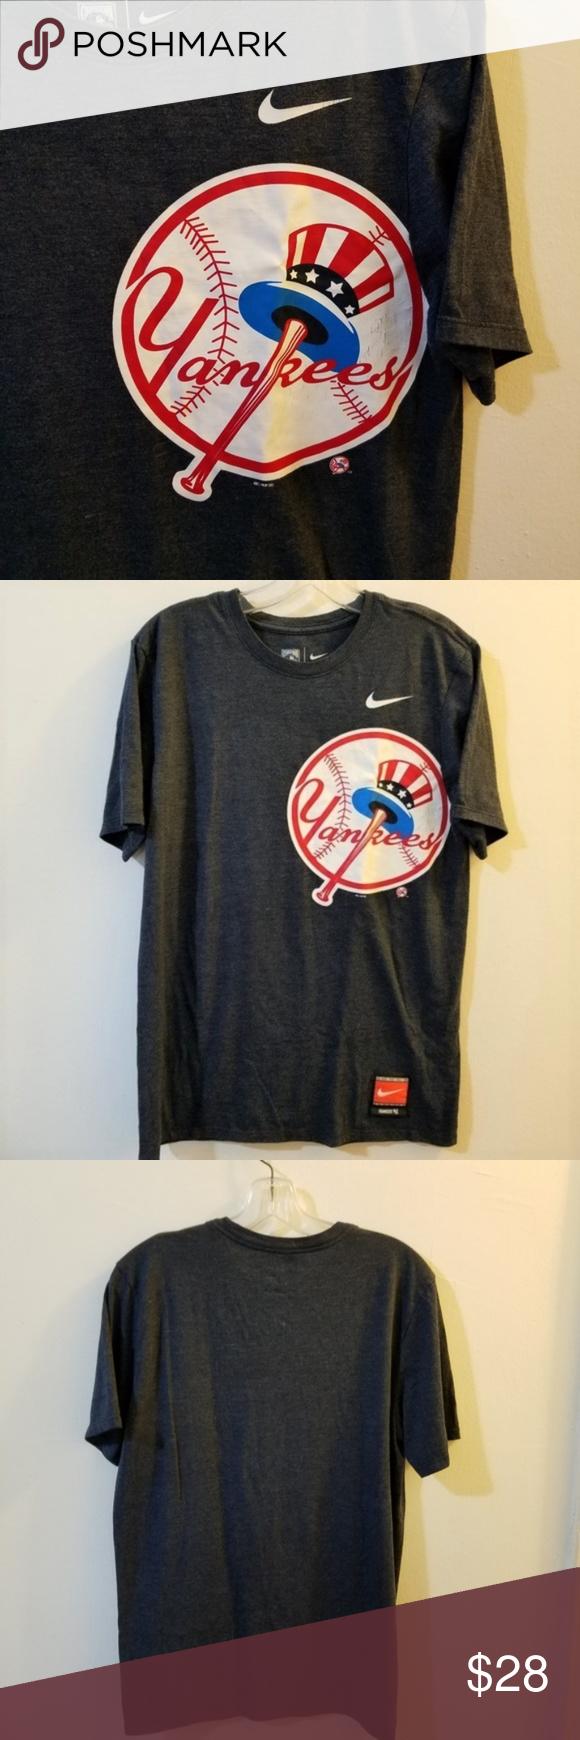 dee45b011 Nike Mlb Cooperstown Old School Logo T Shirt Mens - Nils Stucki ...